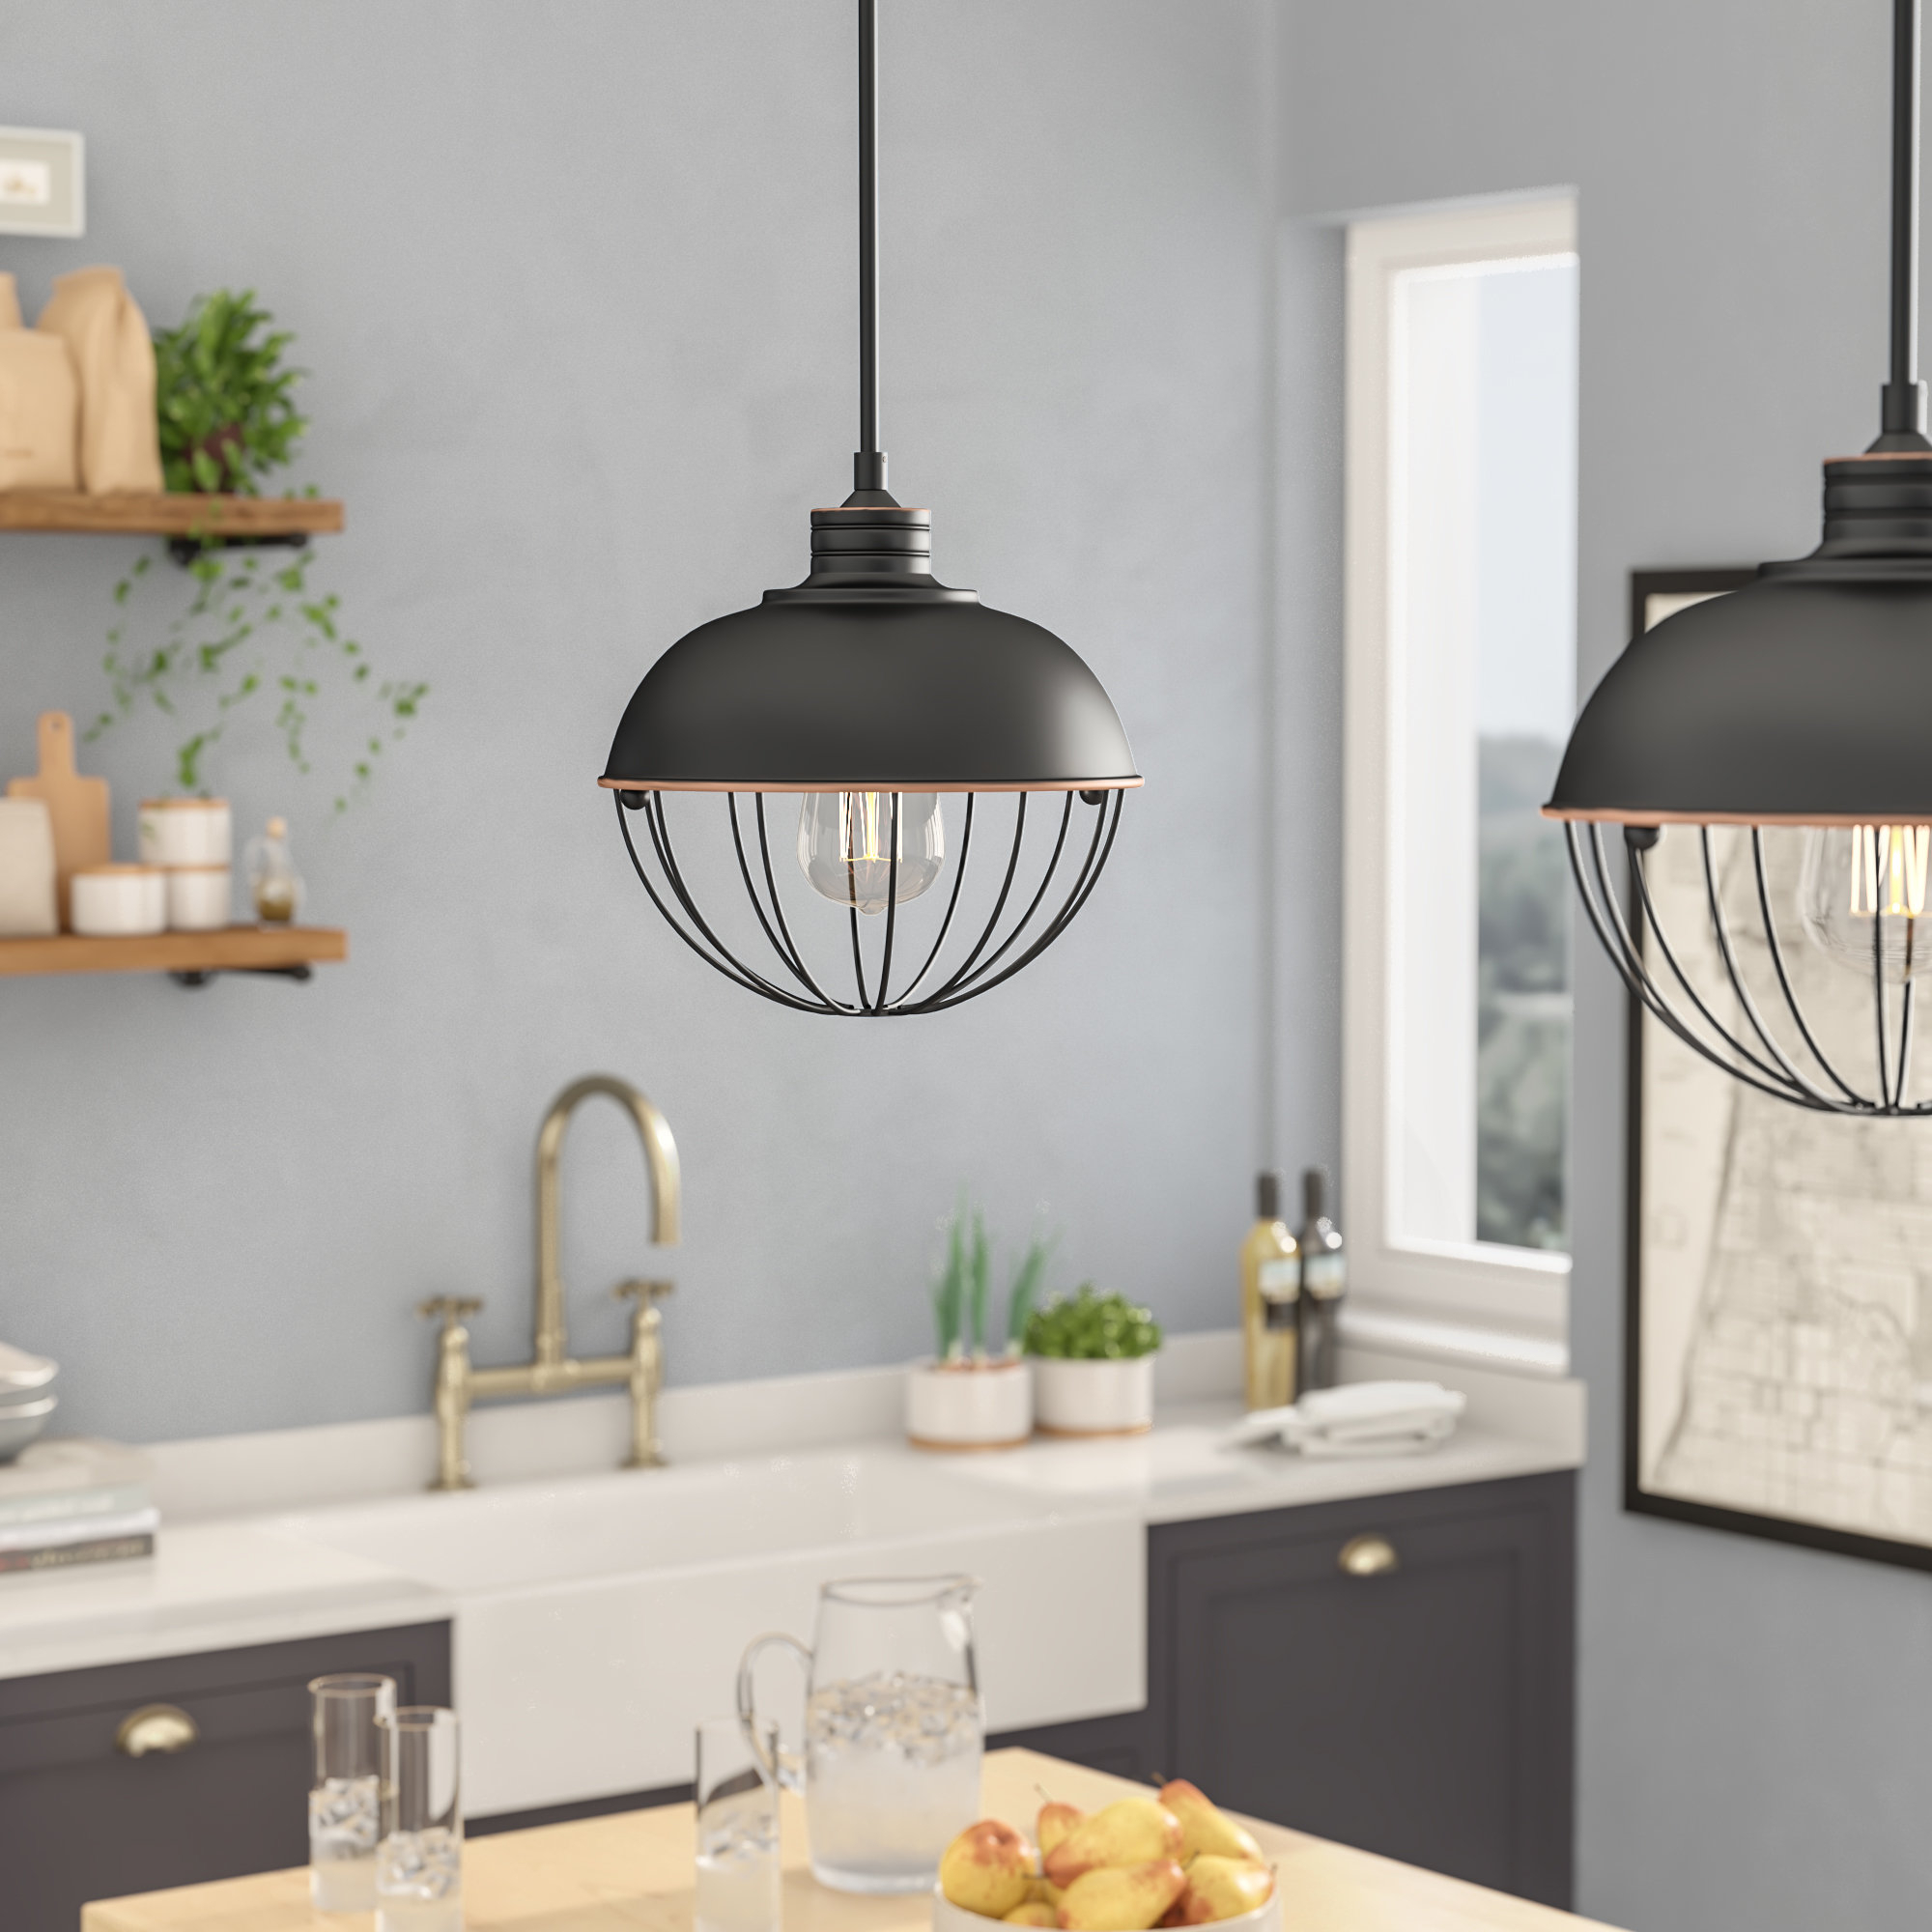 Demi Vintage Edison 1 Light Pendant Within Most Recent Demi 1 Light Globe Pendants (View 3 of 20)